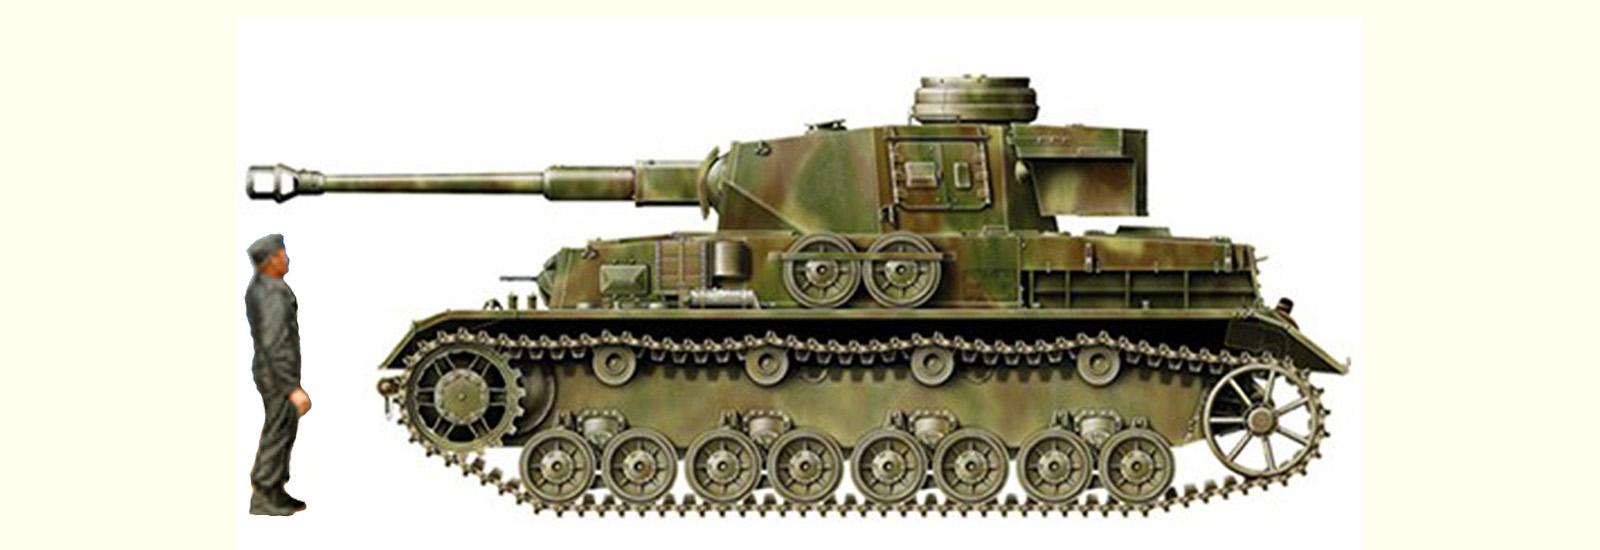 WW2 Armor Identification Galle...